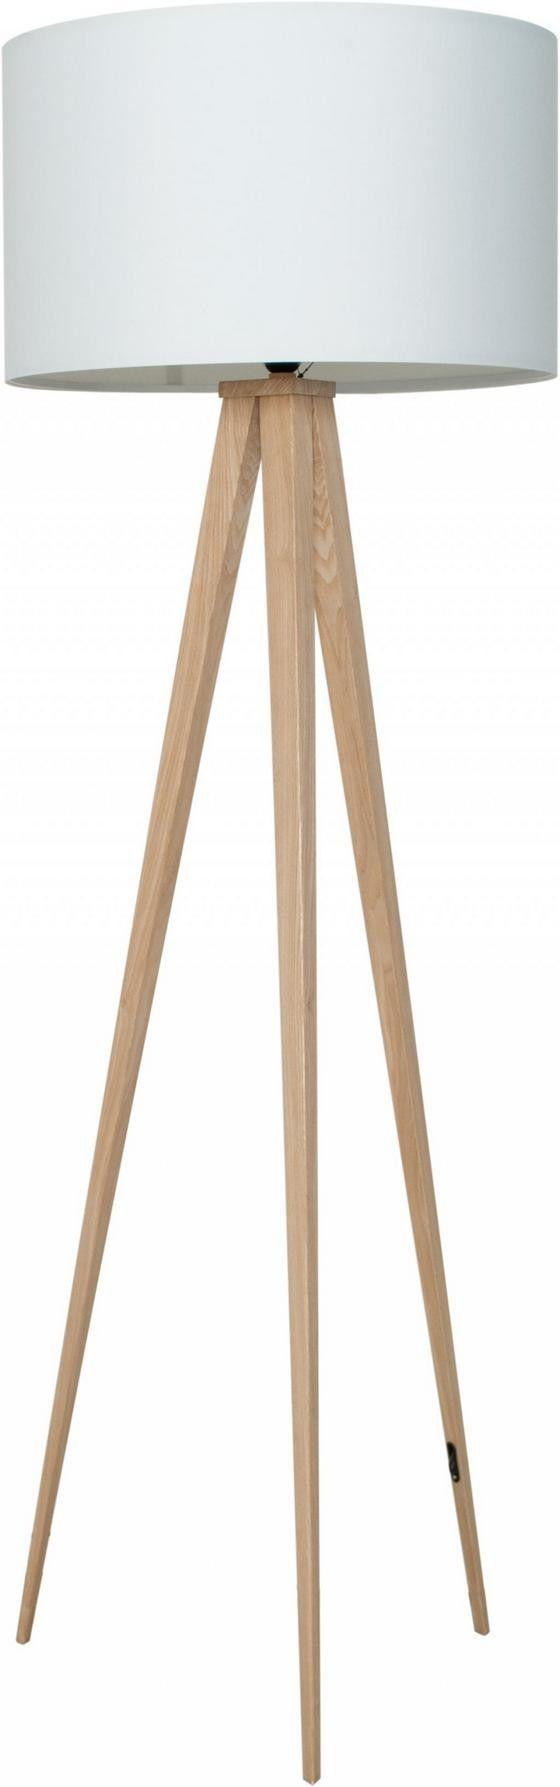 Zuiver Staande lamp Tripod hout/wit design lamp